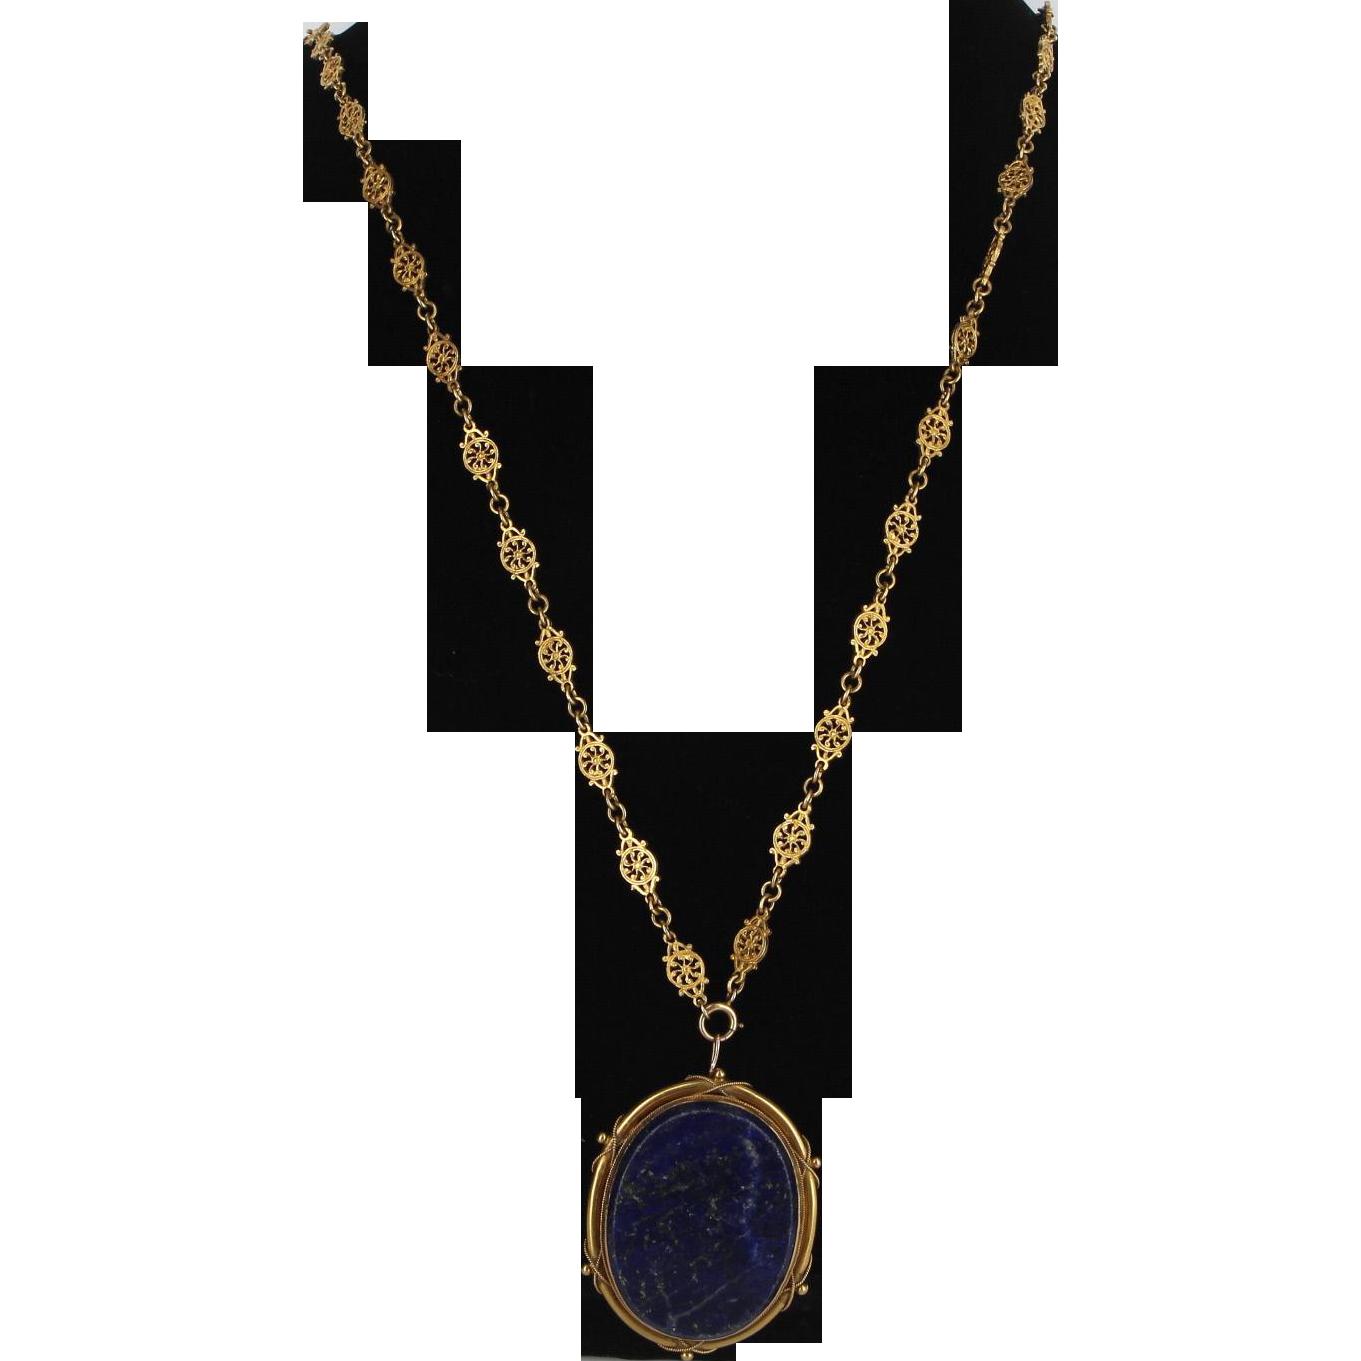 Antique Victorian Statement Necklace 14 Karat Yellow Gold Lapis Vintage Fine Jewelry